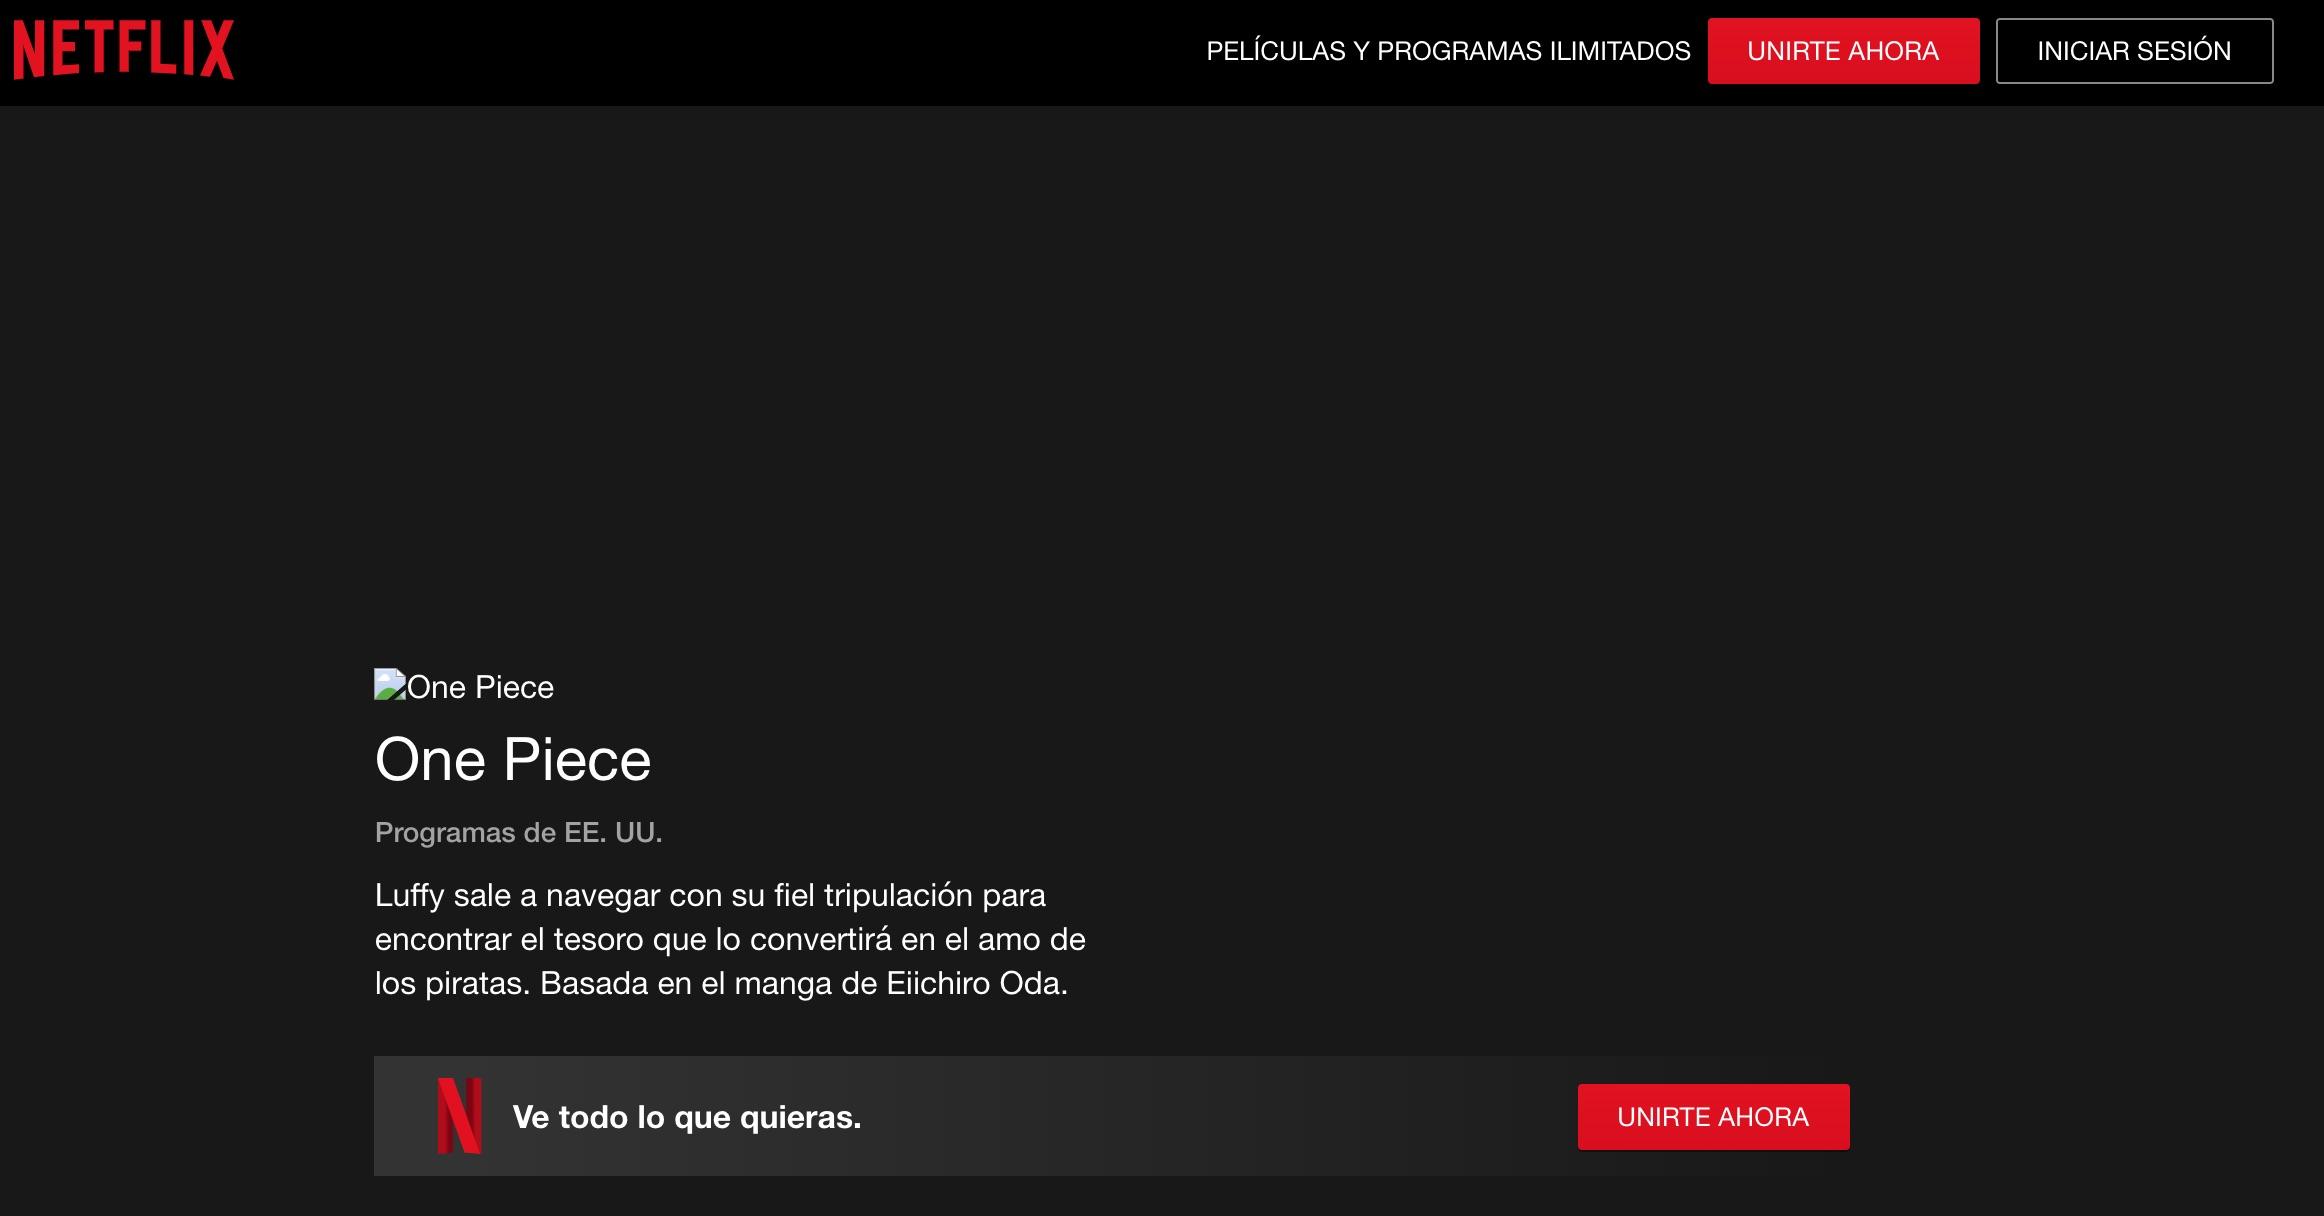 Netflix-One Piece